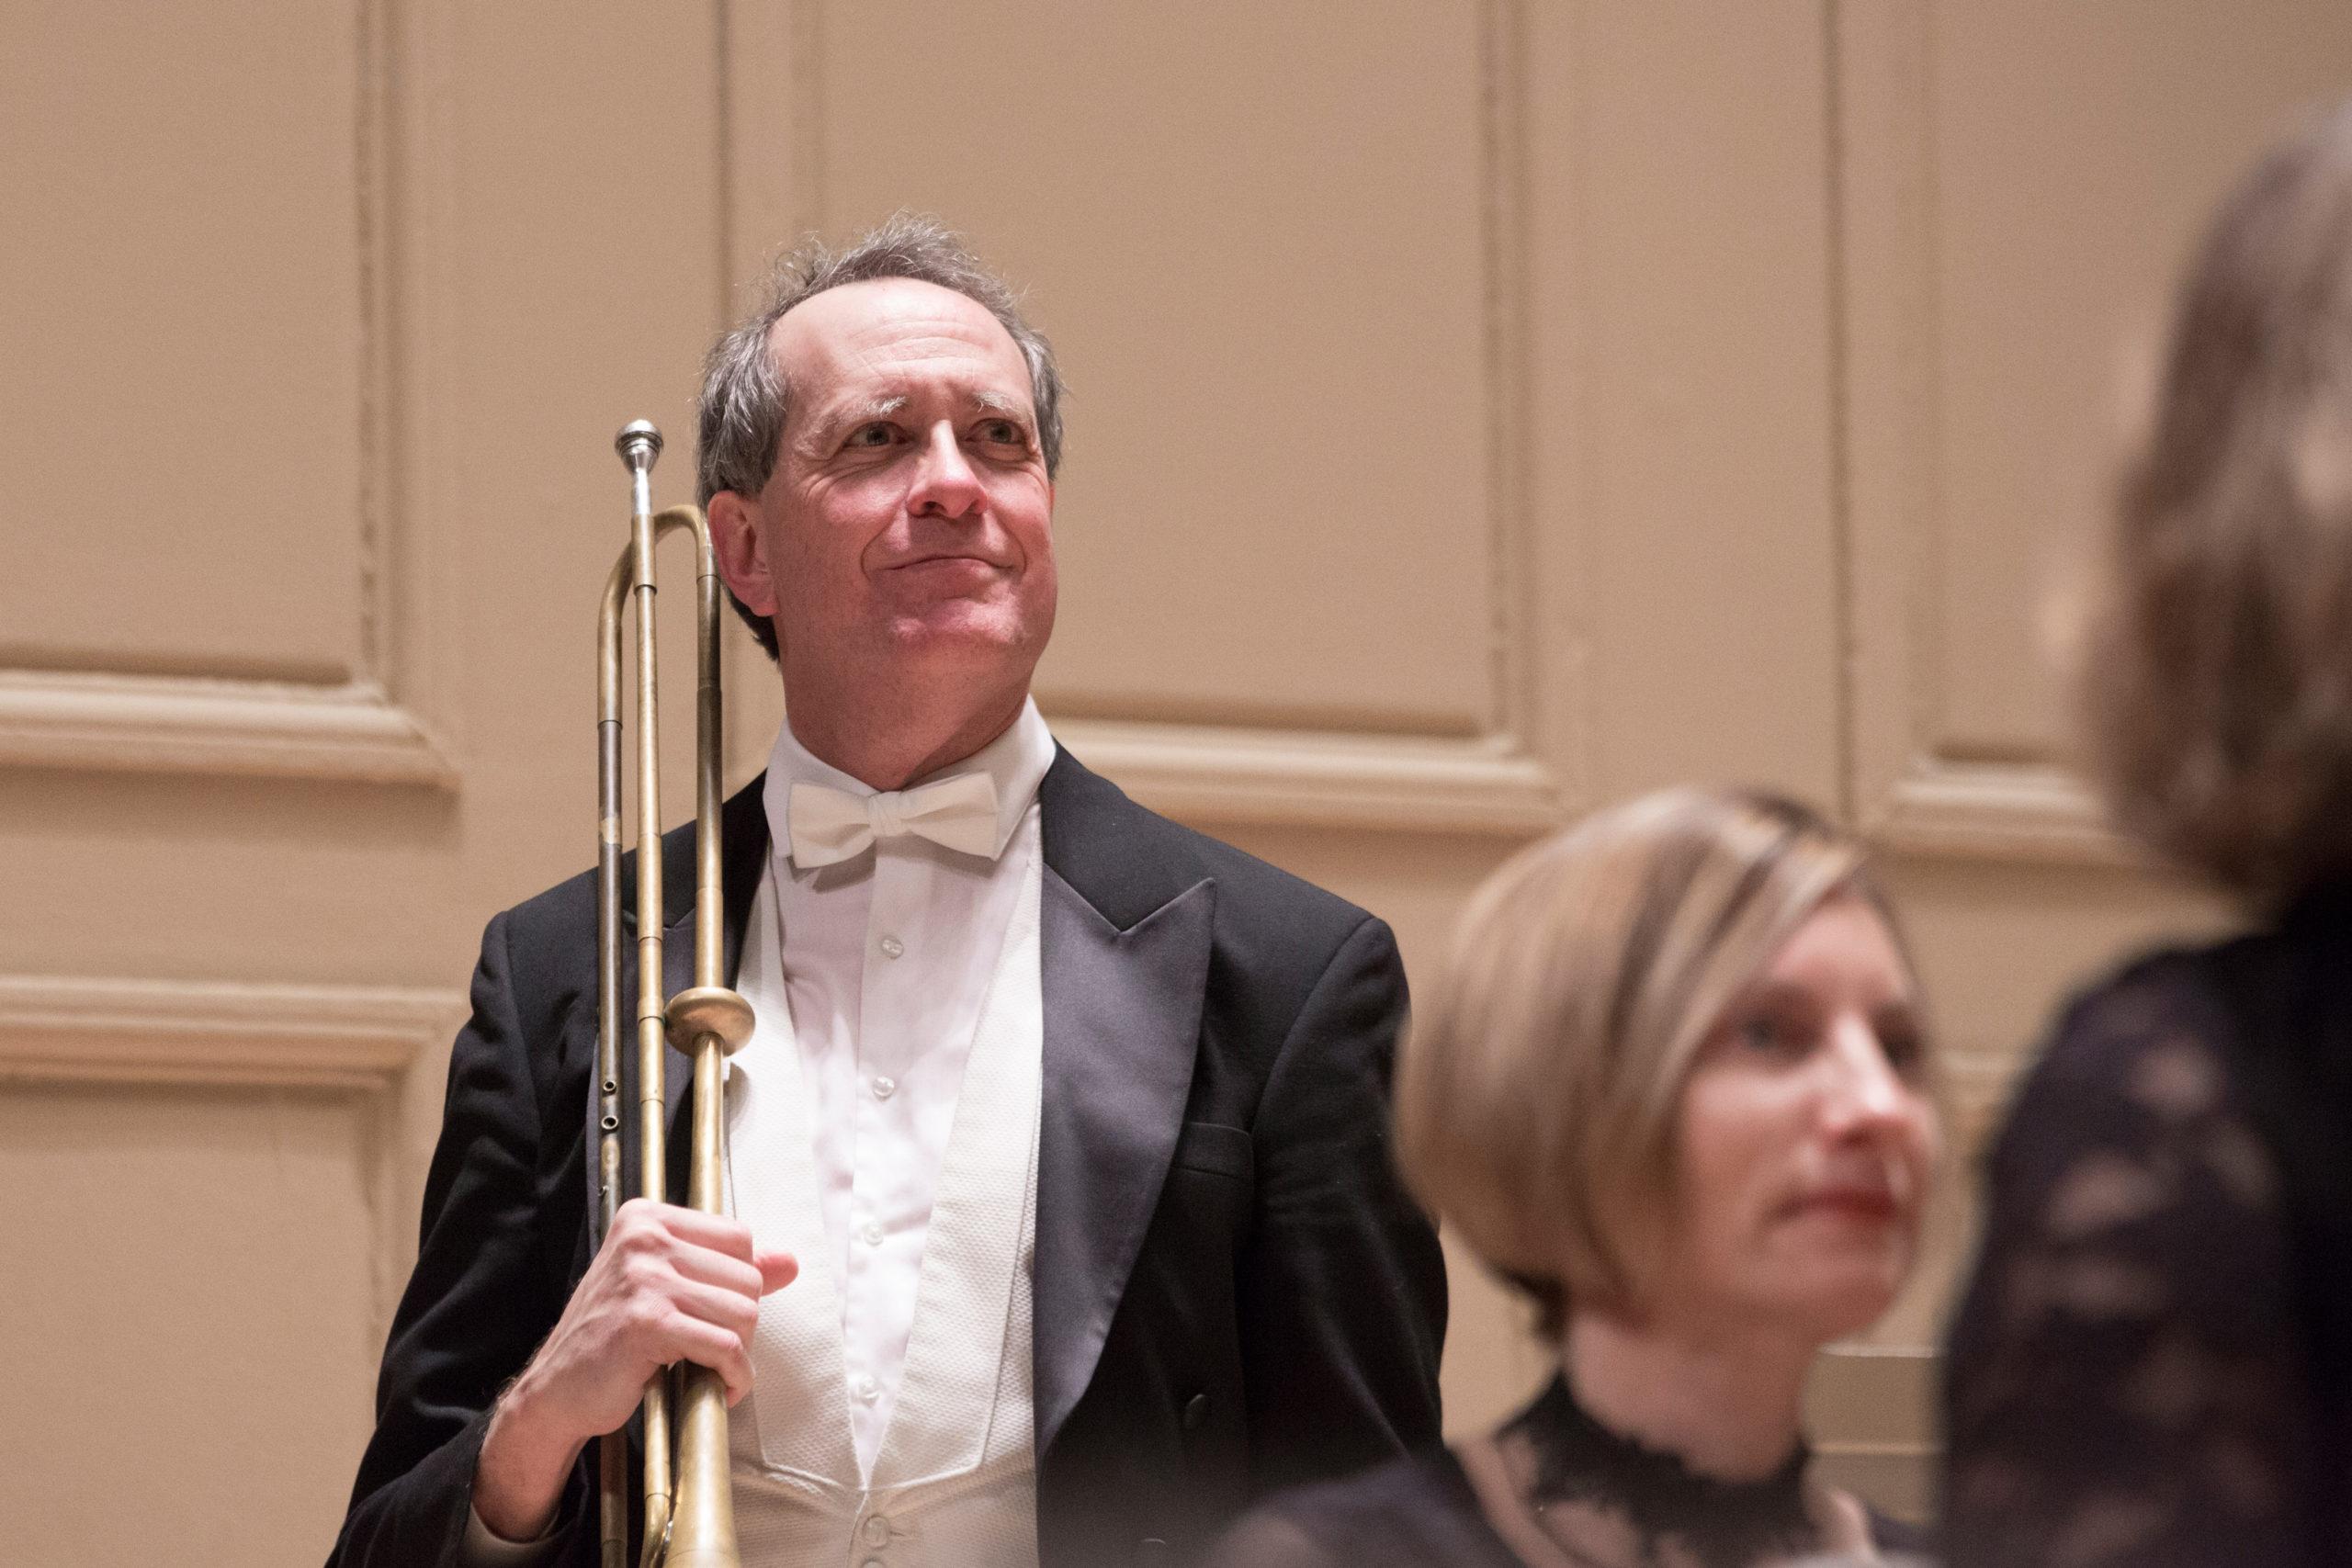 Trumpeter Jesse Levine smiling